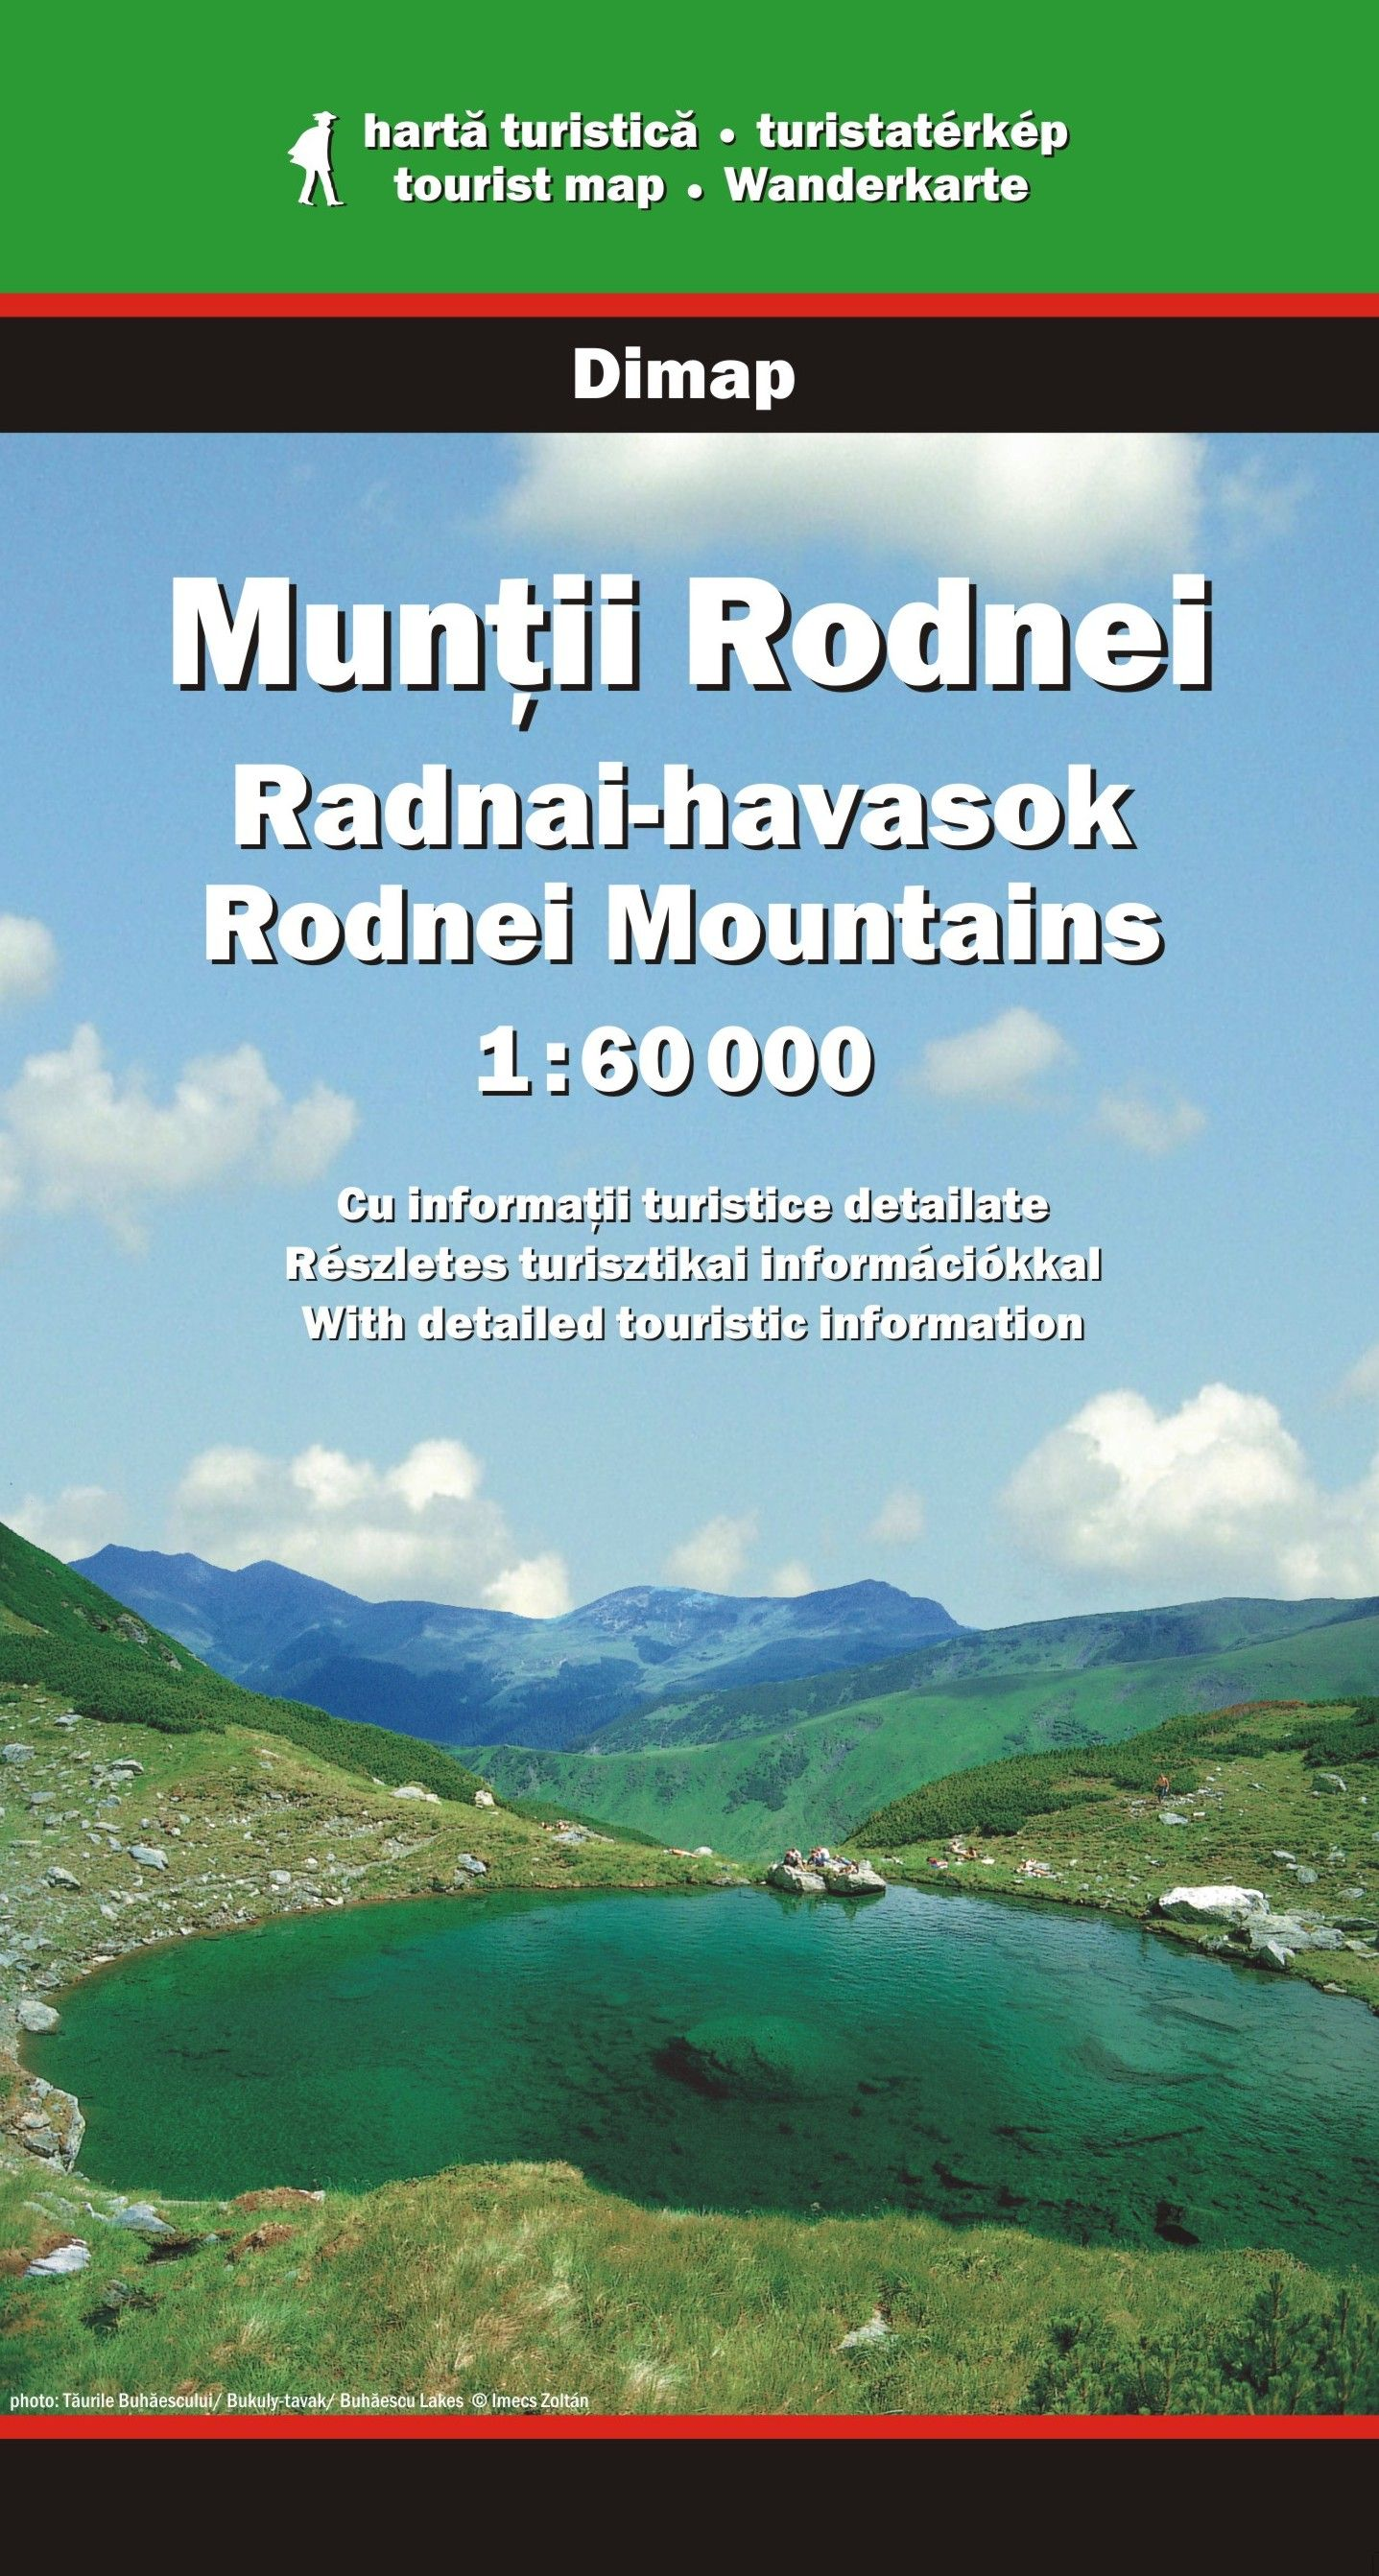 Detailed tourist information in 4 languages (English, German, Hungarian, Romanian)